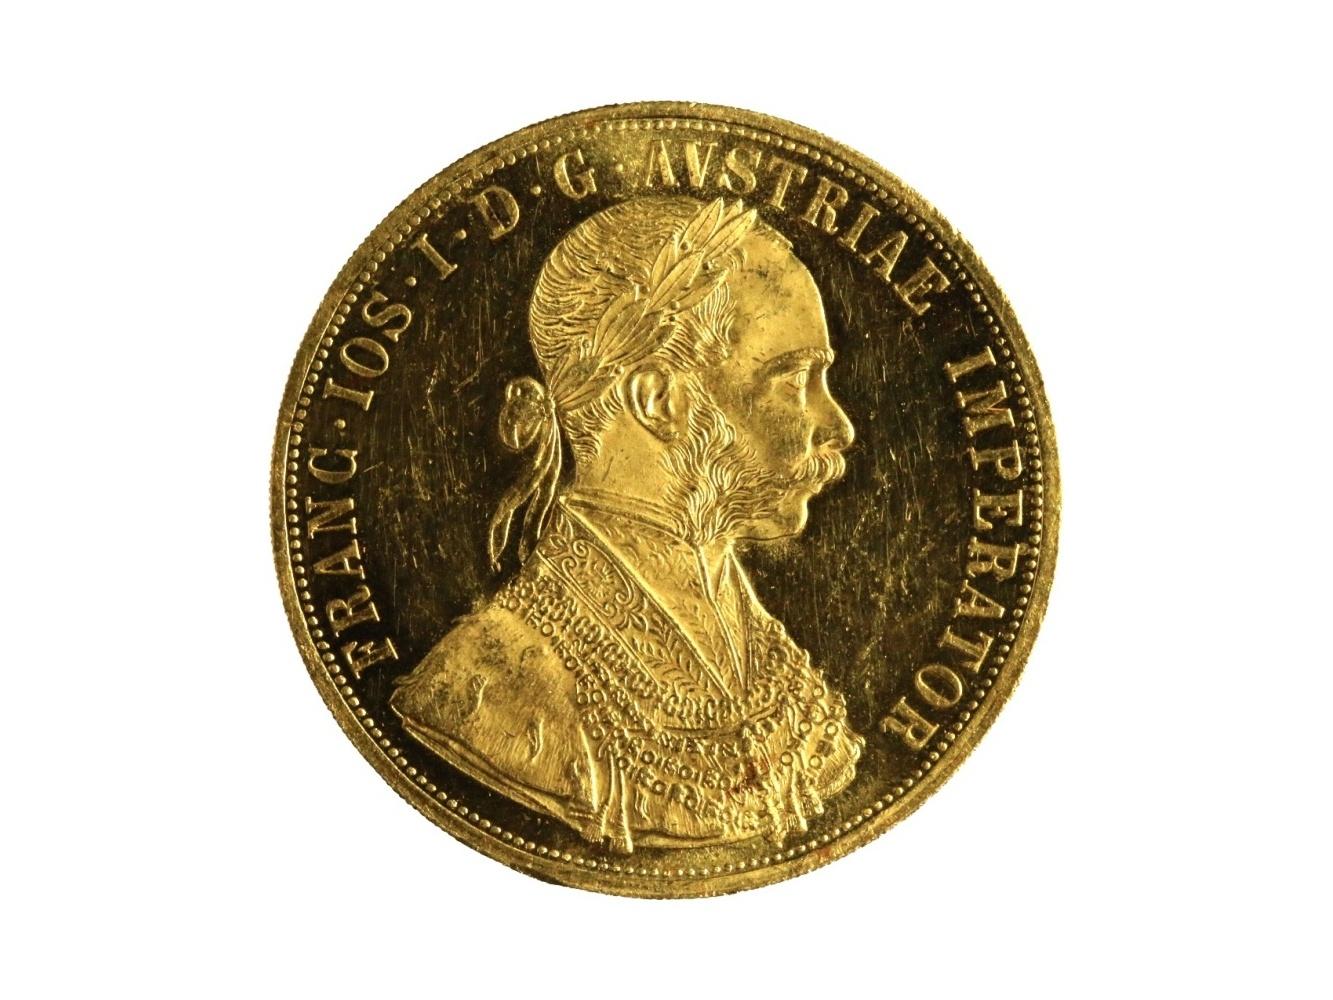 František Josef I. 1848-1916 - 4 Dukát 1914, N 117